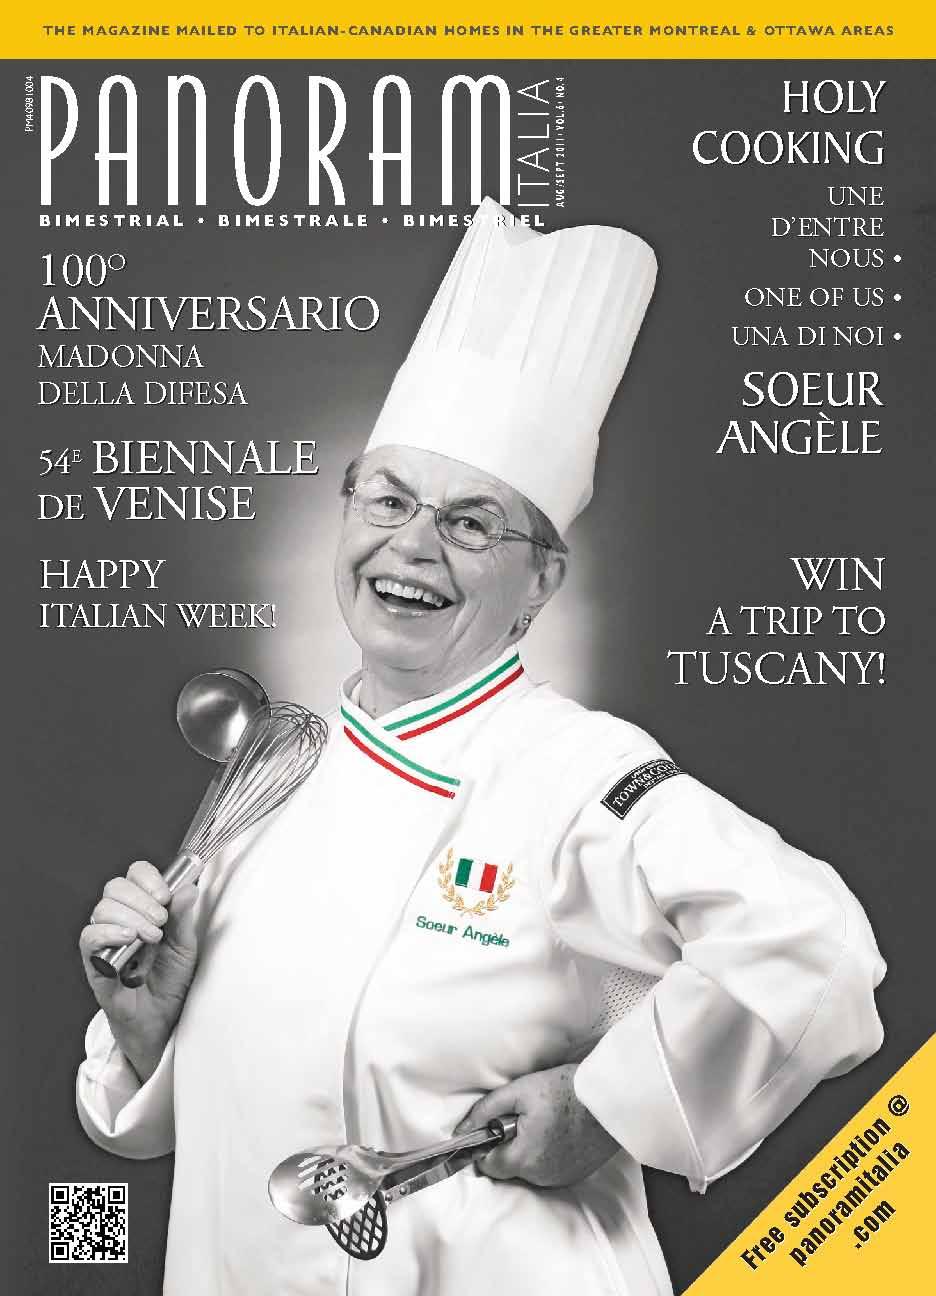 Panoram Italia No.4 August/September 2011